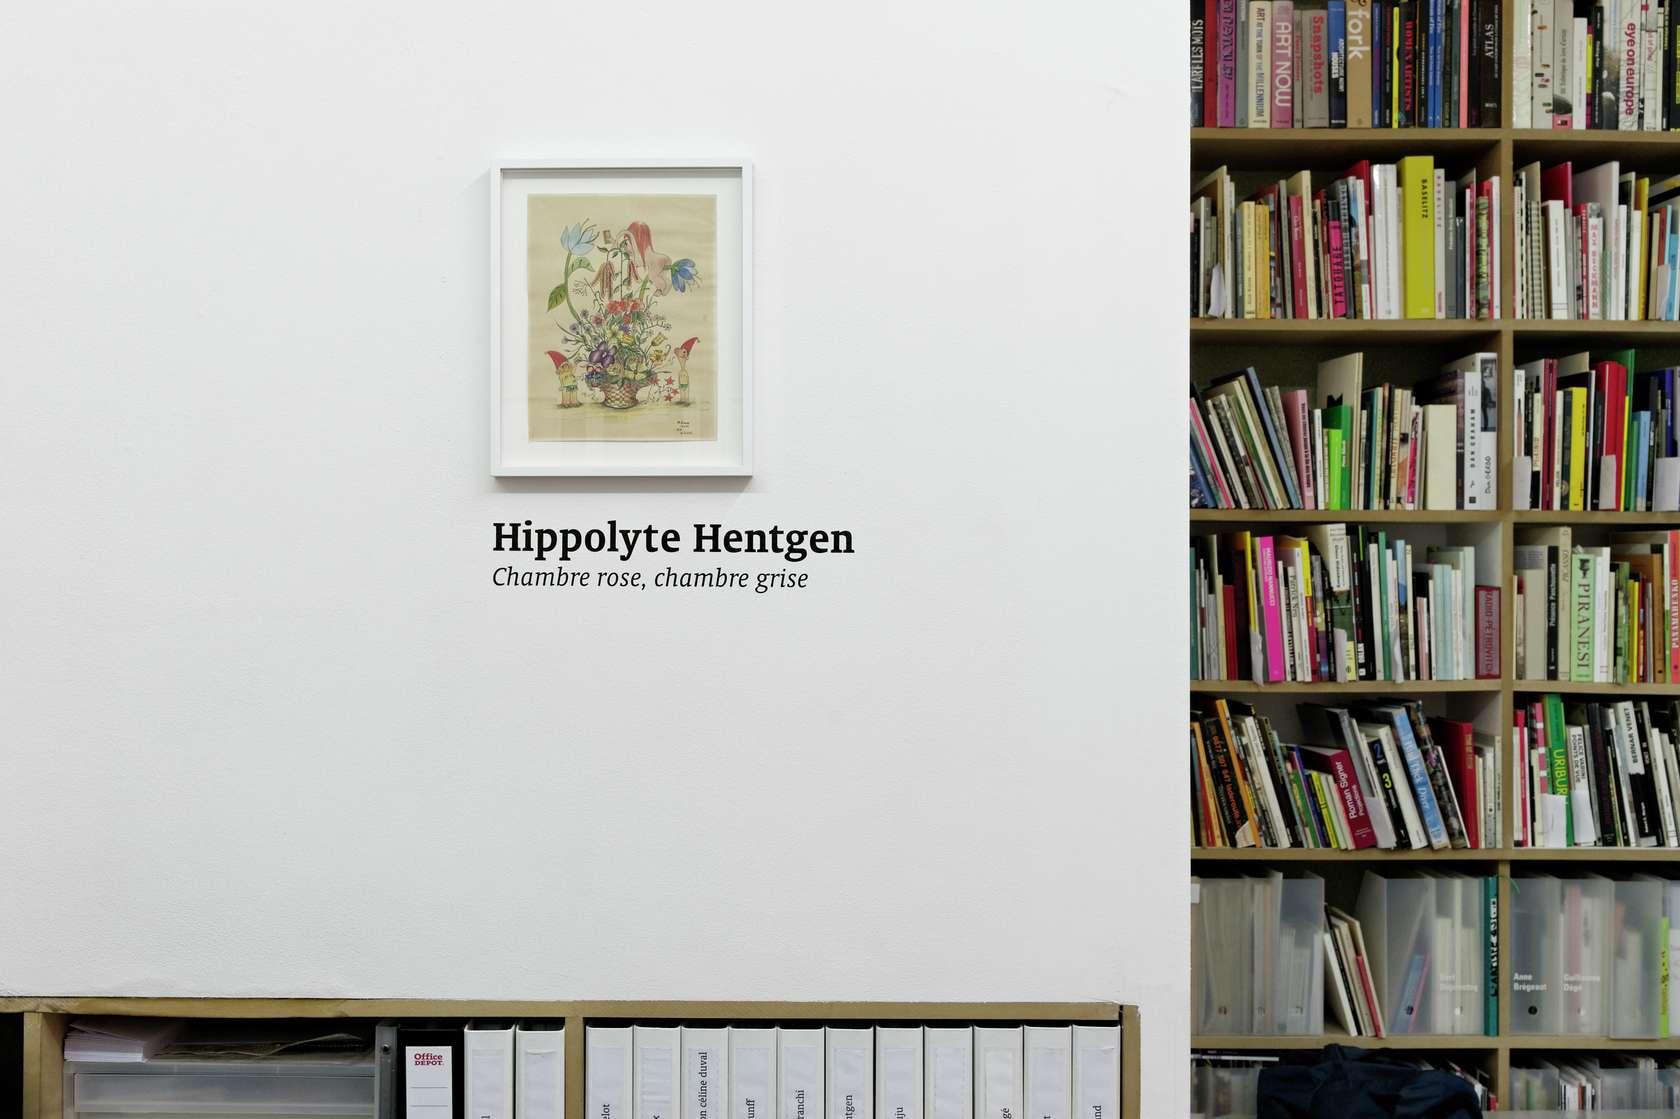 Hippolyte Hentgen Chambre rose, chambre grise Semiose 8 septembre  — 6 octobre 2012